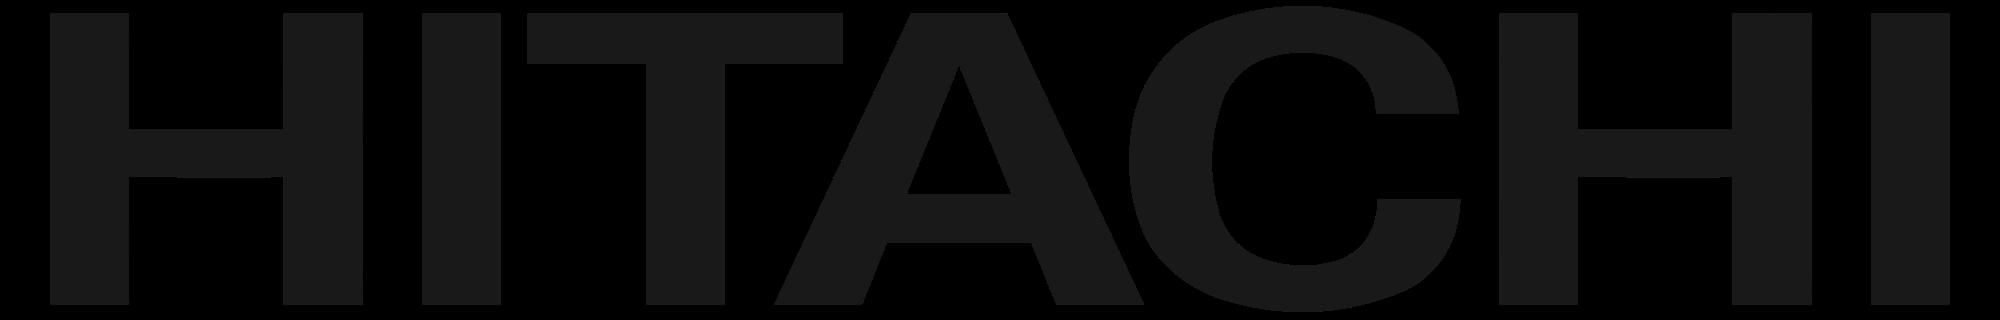 2000px-Hitachi_logo.svg